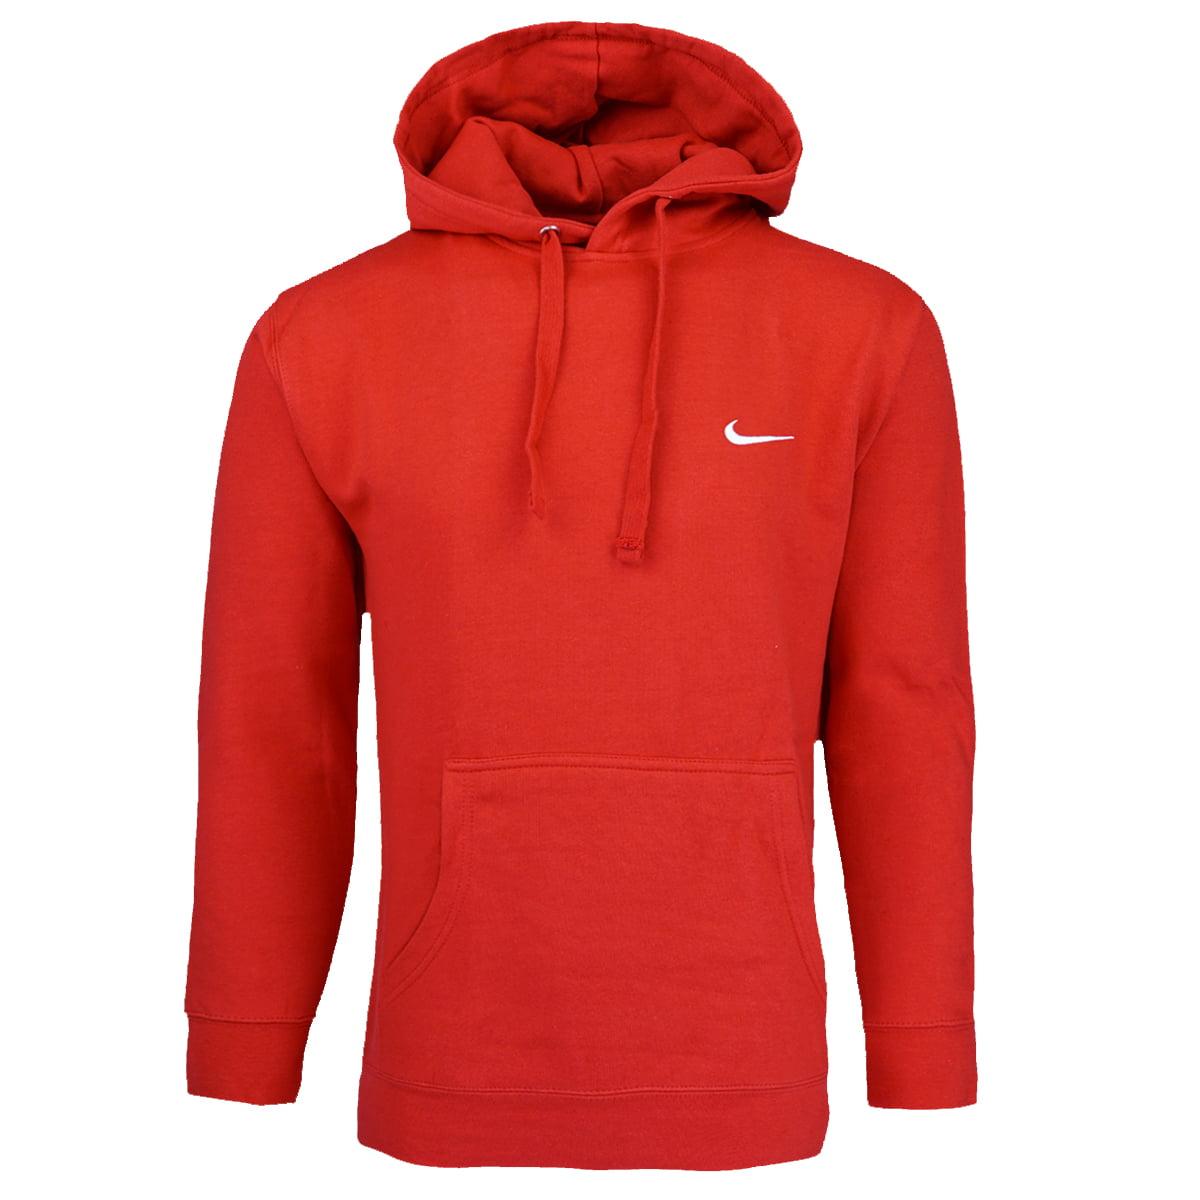 Nike Men's Swoosh Pullover Hoodie Red L